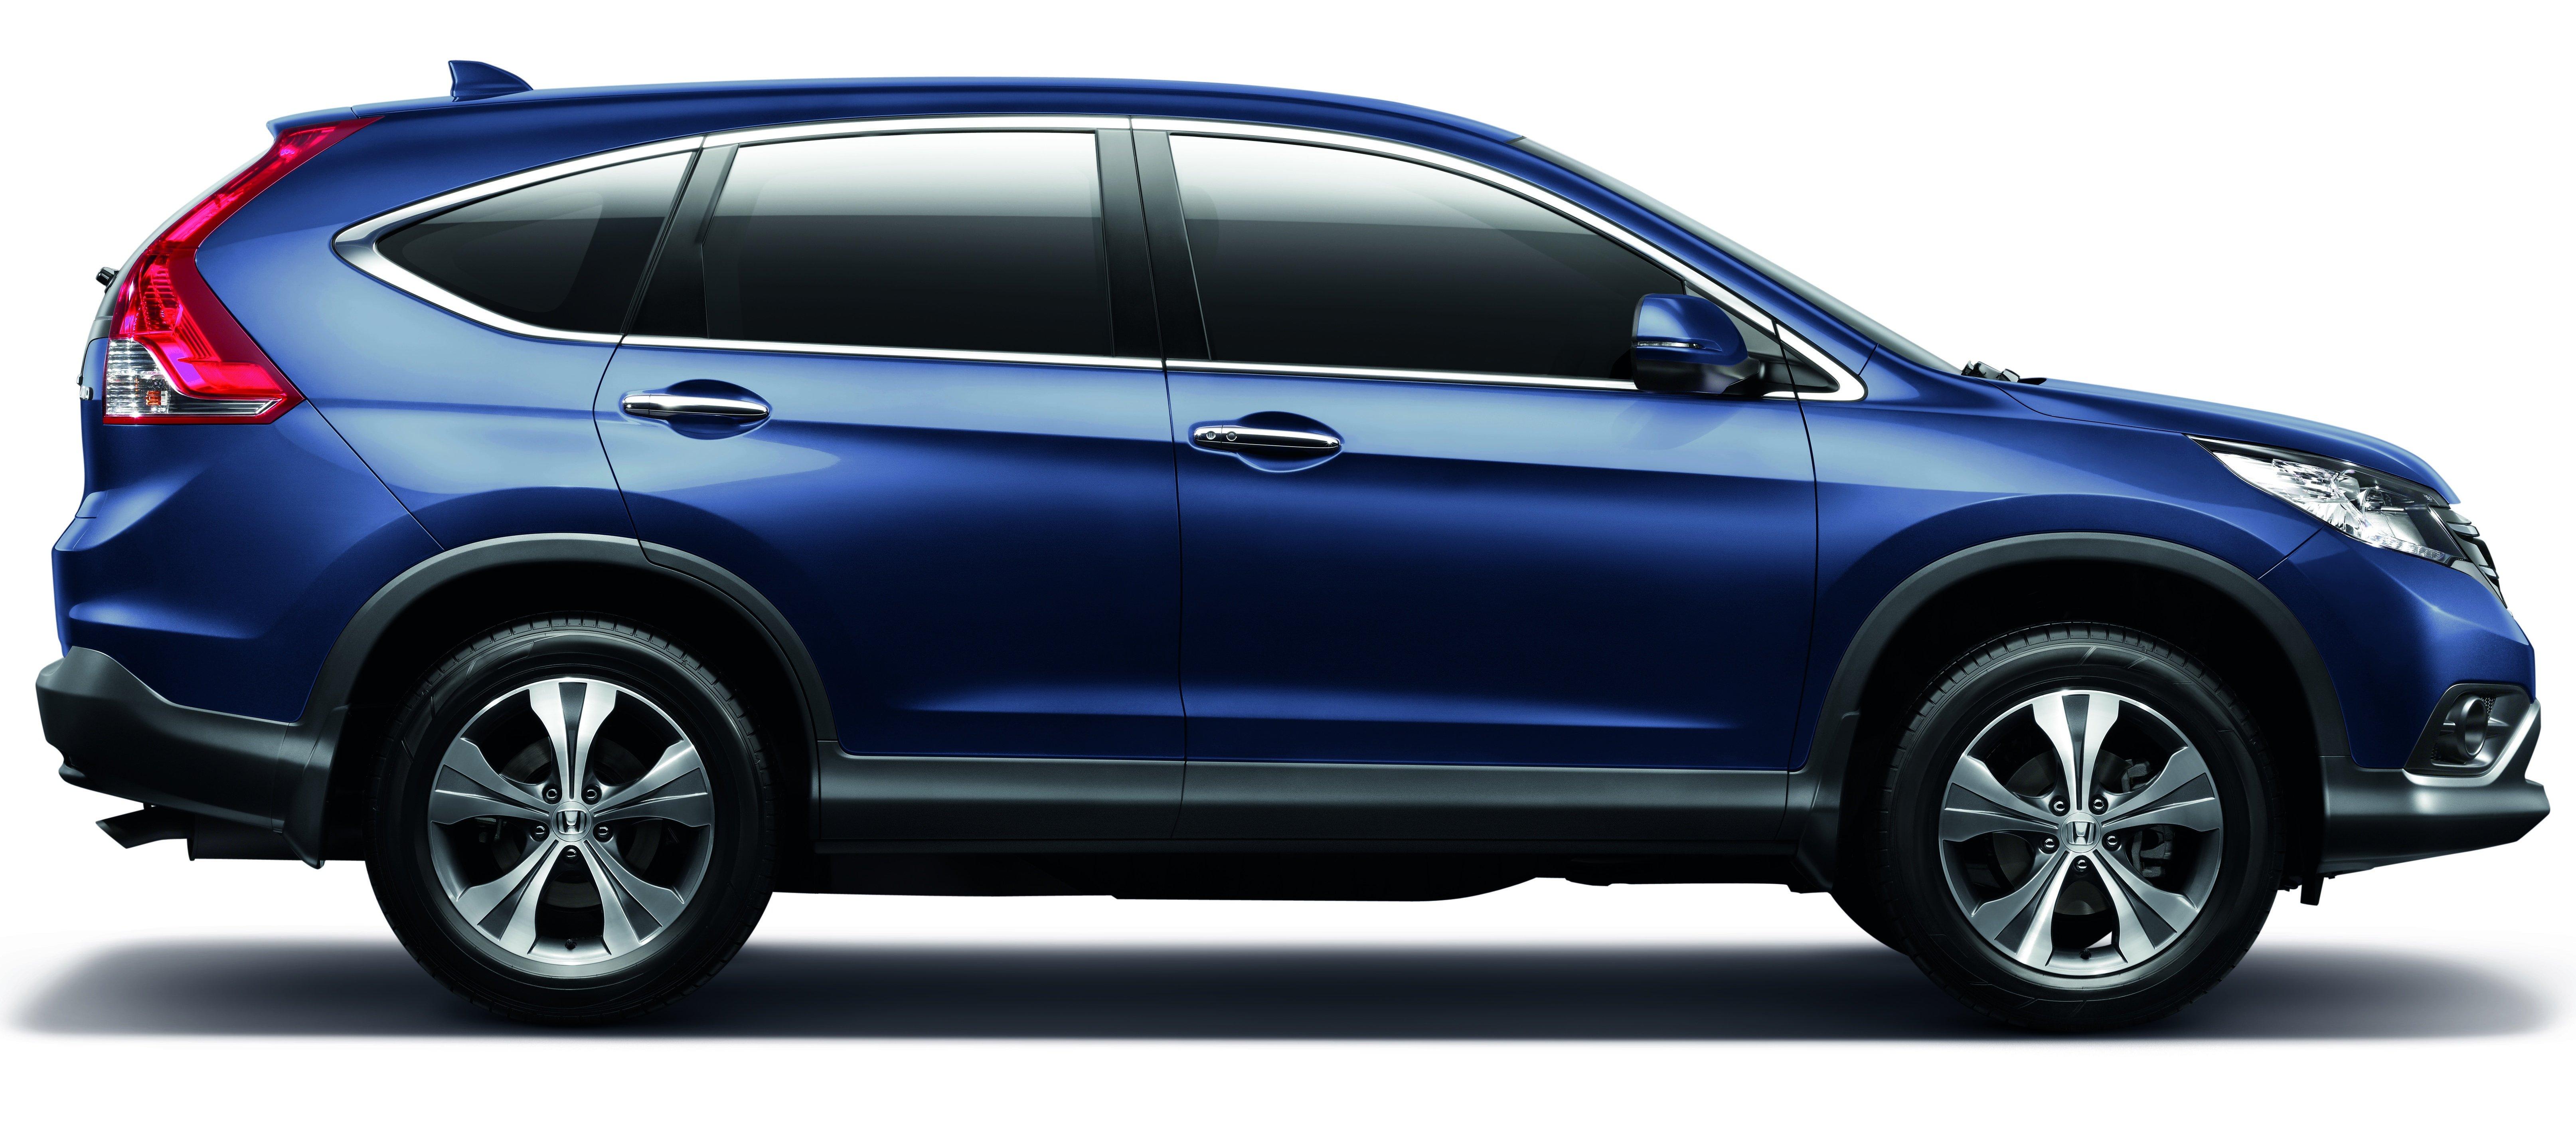 Honda CR-V 2014 Colors